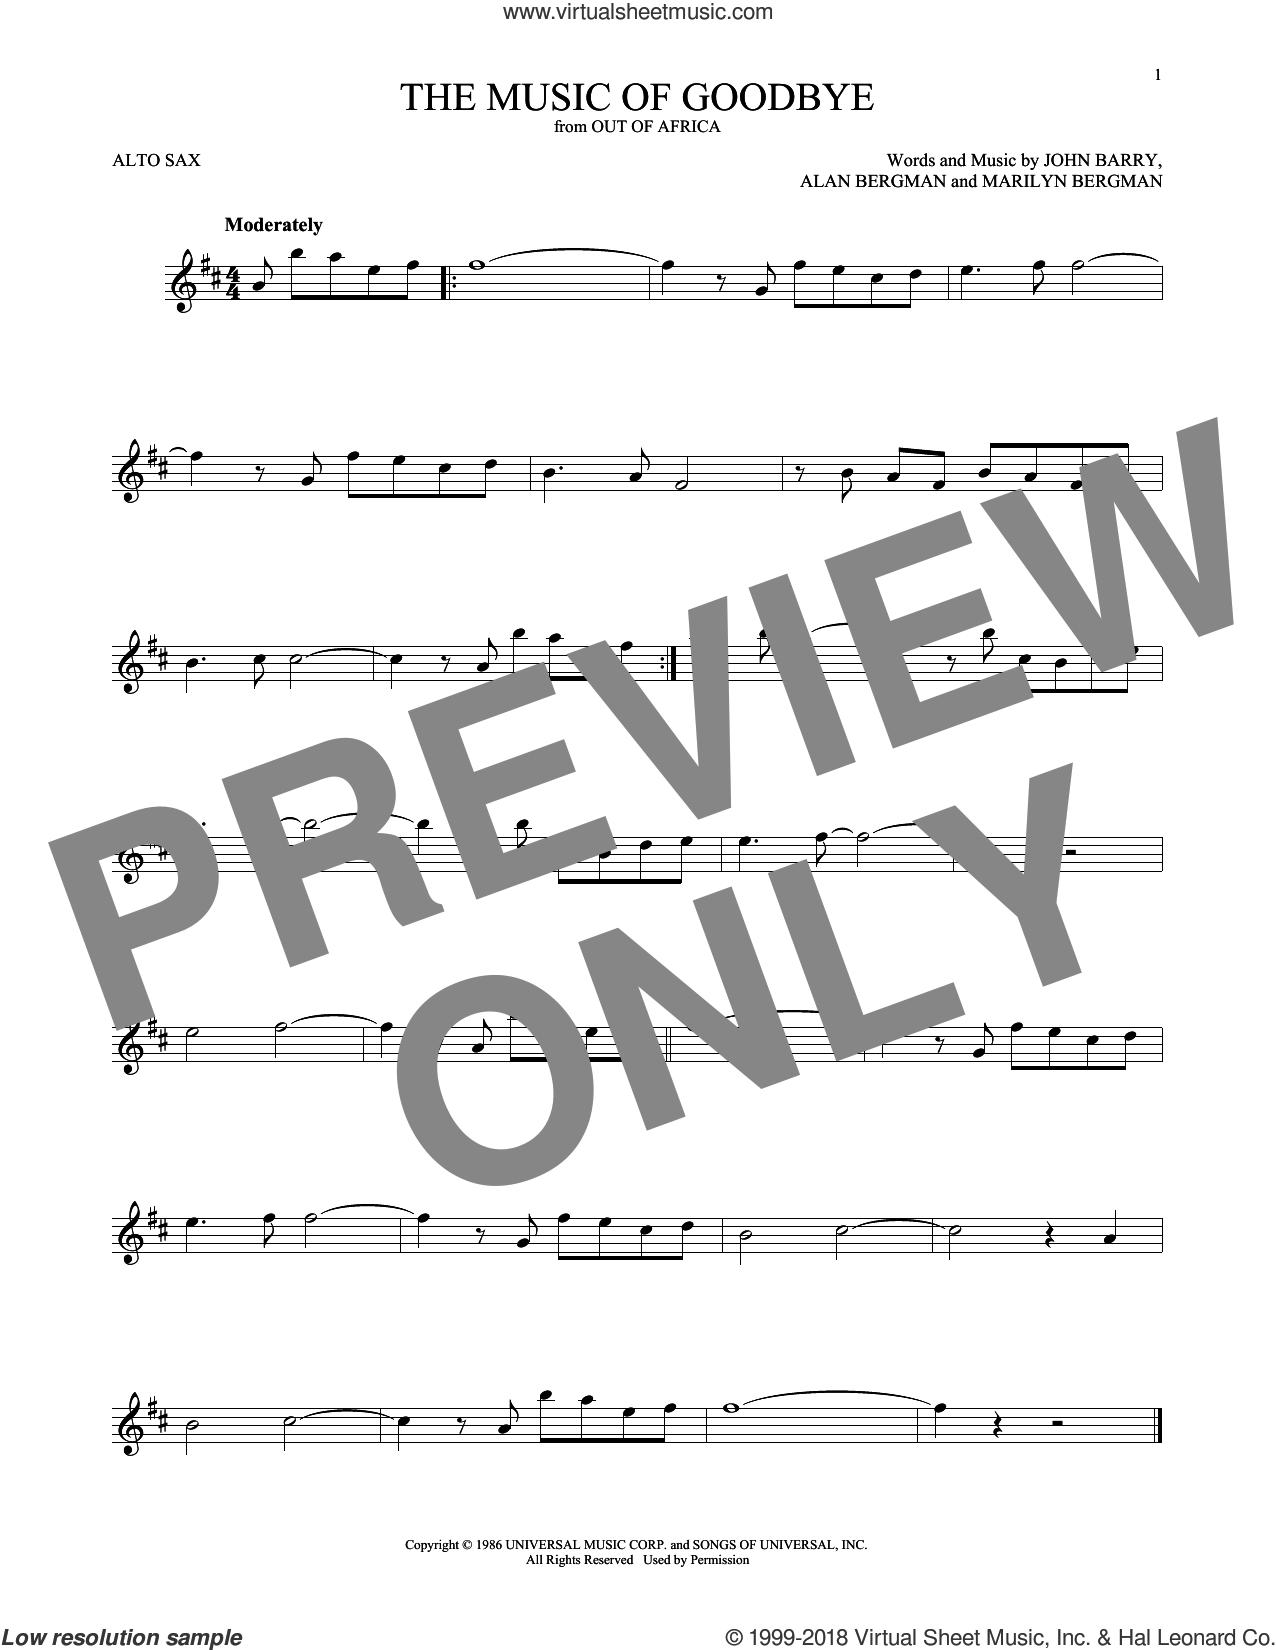 The Music Of Goodbye sheet music for alto saxophone solo by John Barry, Alan Bergman and Marilyn Bergman, intermediate skill level